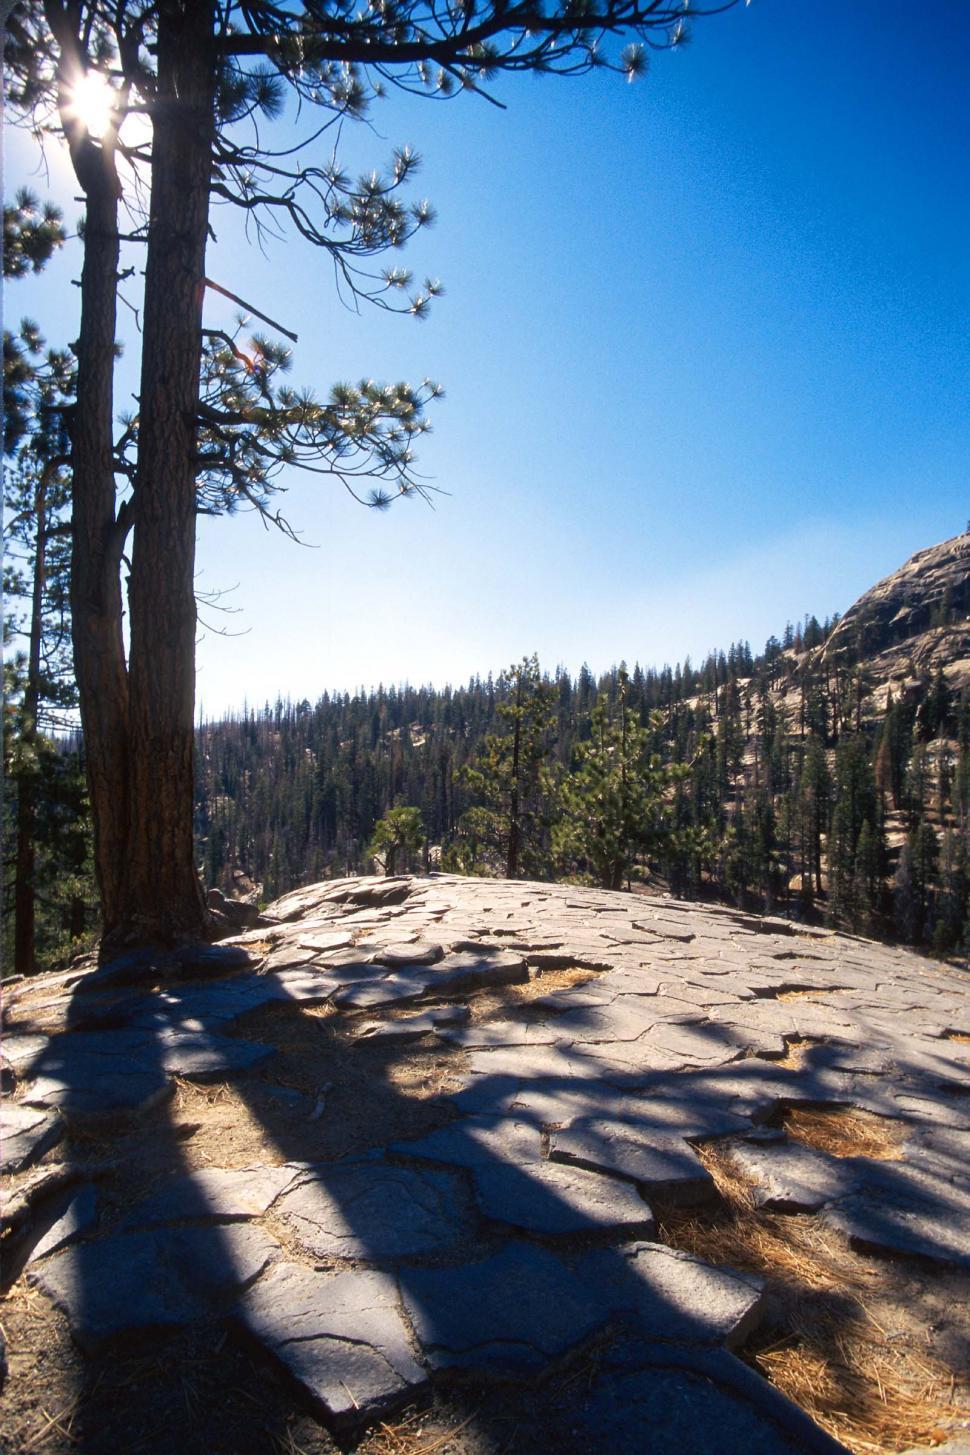 Download Free Stock Photo of pines trees mountains rocks devils postpile national monument columns basalt wilderness geological formation fractured cracks cracked